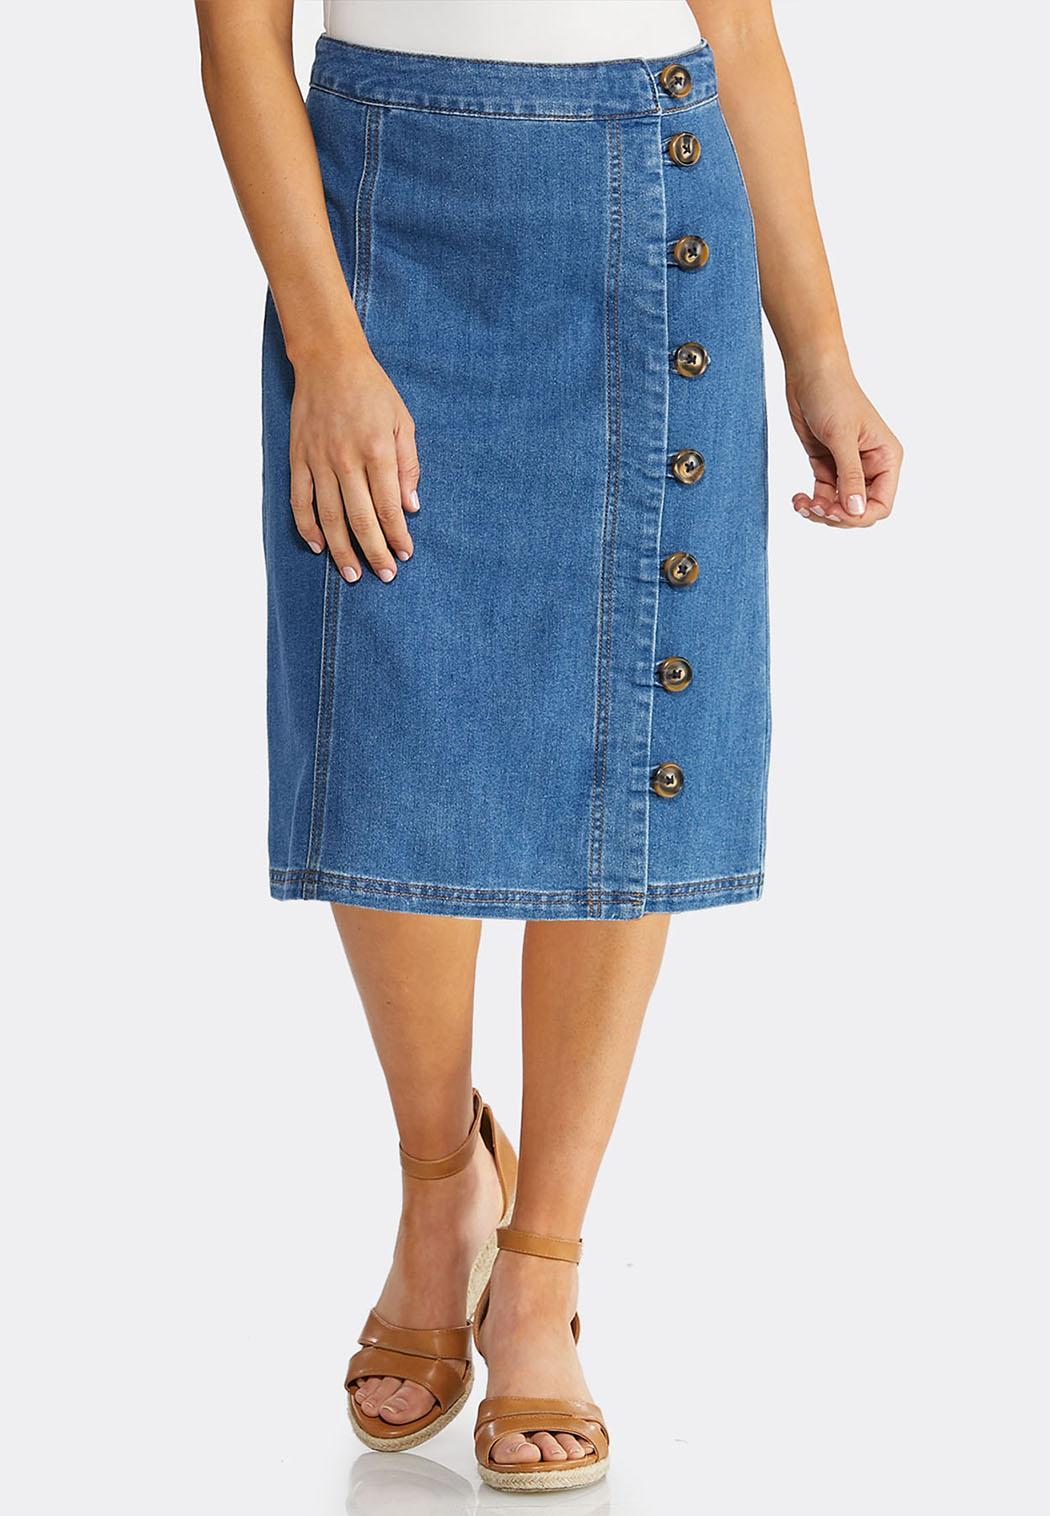 6f735c0f1b4 Plus Size Tortoise Button Denim Skirt Skirts Cato Fashions